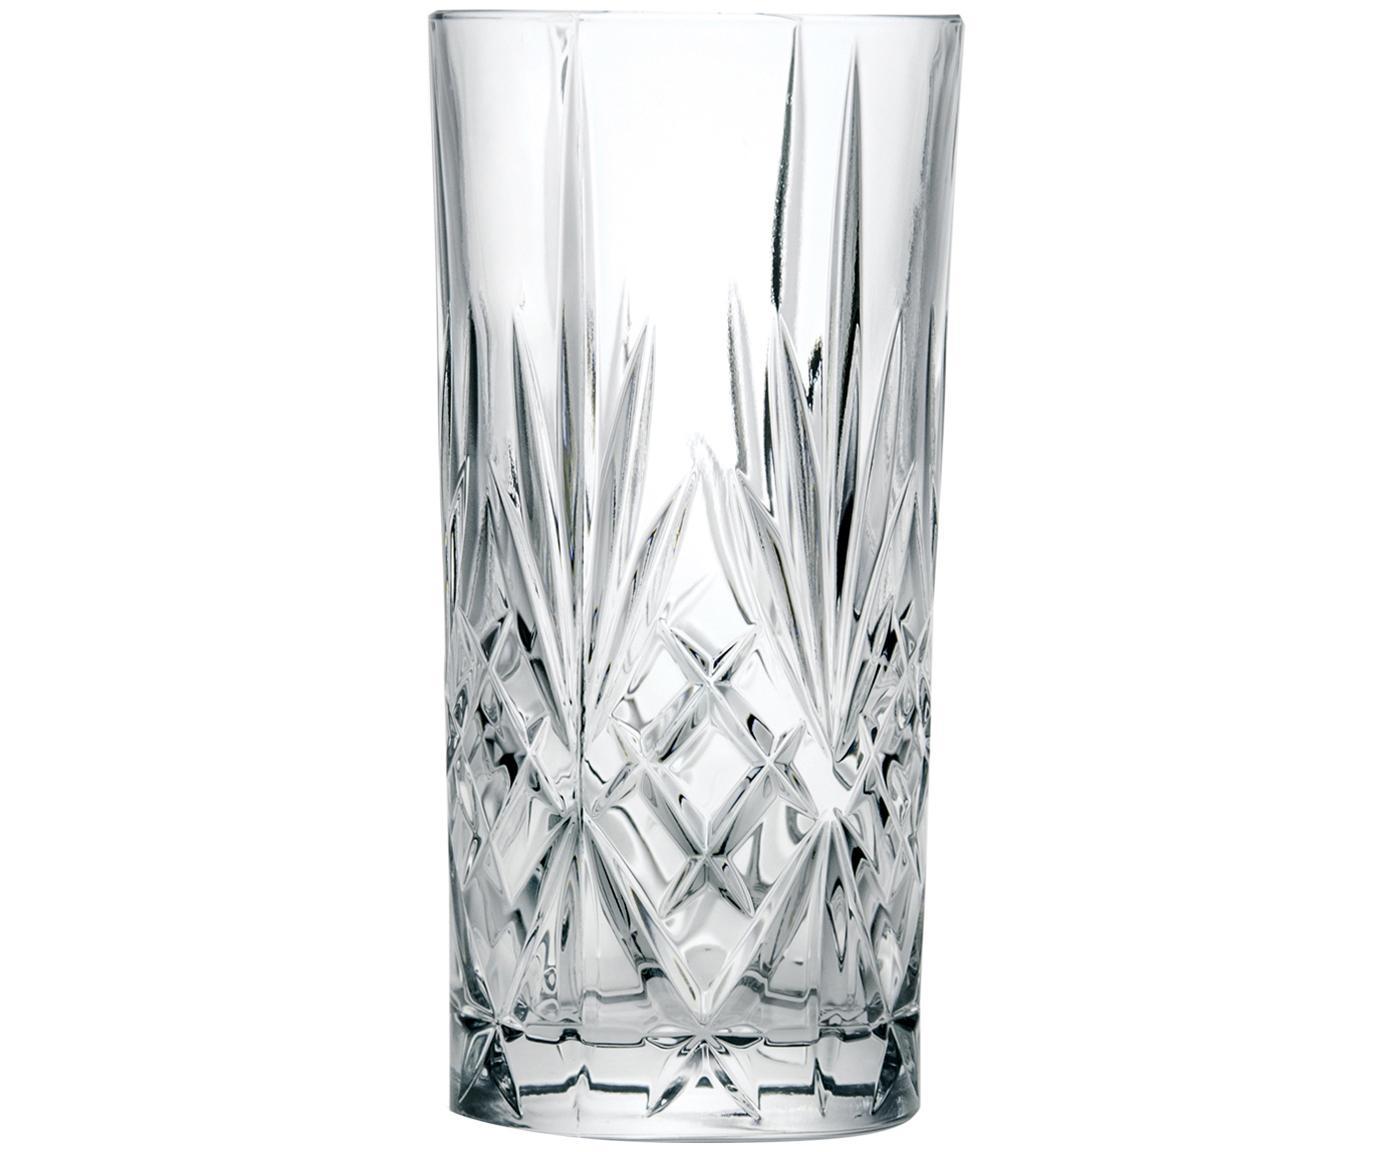 Vasos highball de cristal Melodia, 6uds., Cristal, Transparente, Ø 7 x Al 15 cm